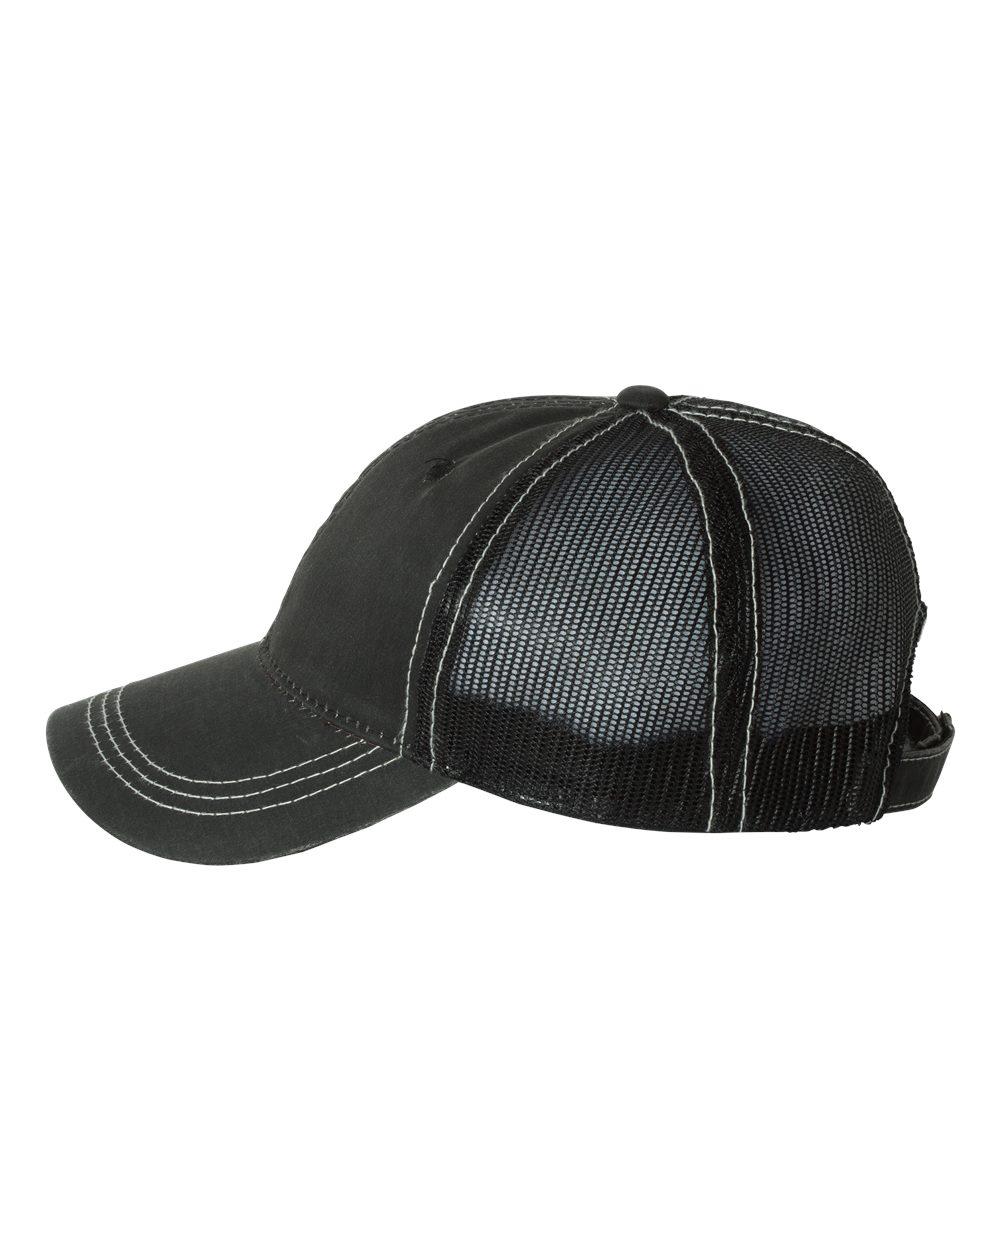 Outdoor Cap HPD610M - Weathered Cotton Mesh Back Cap